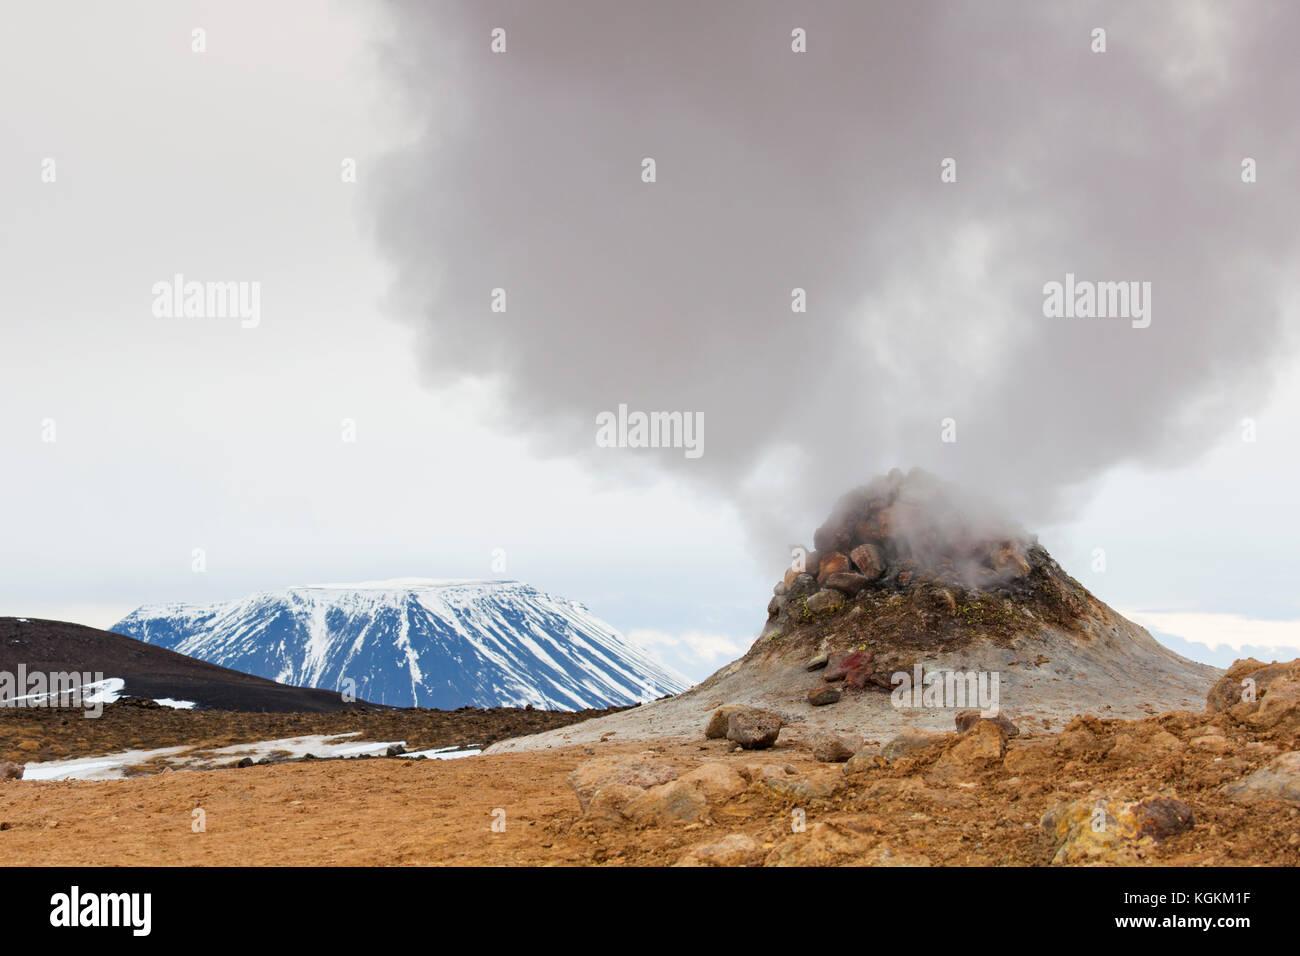 Fumarole de vapor en Hverir, área geotérmica cerca de Námafjall, Norðurland eystra / Nordurland eystra, Islandia Foto de stock